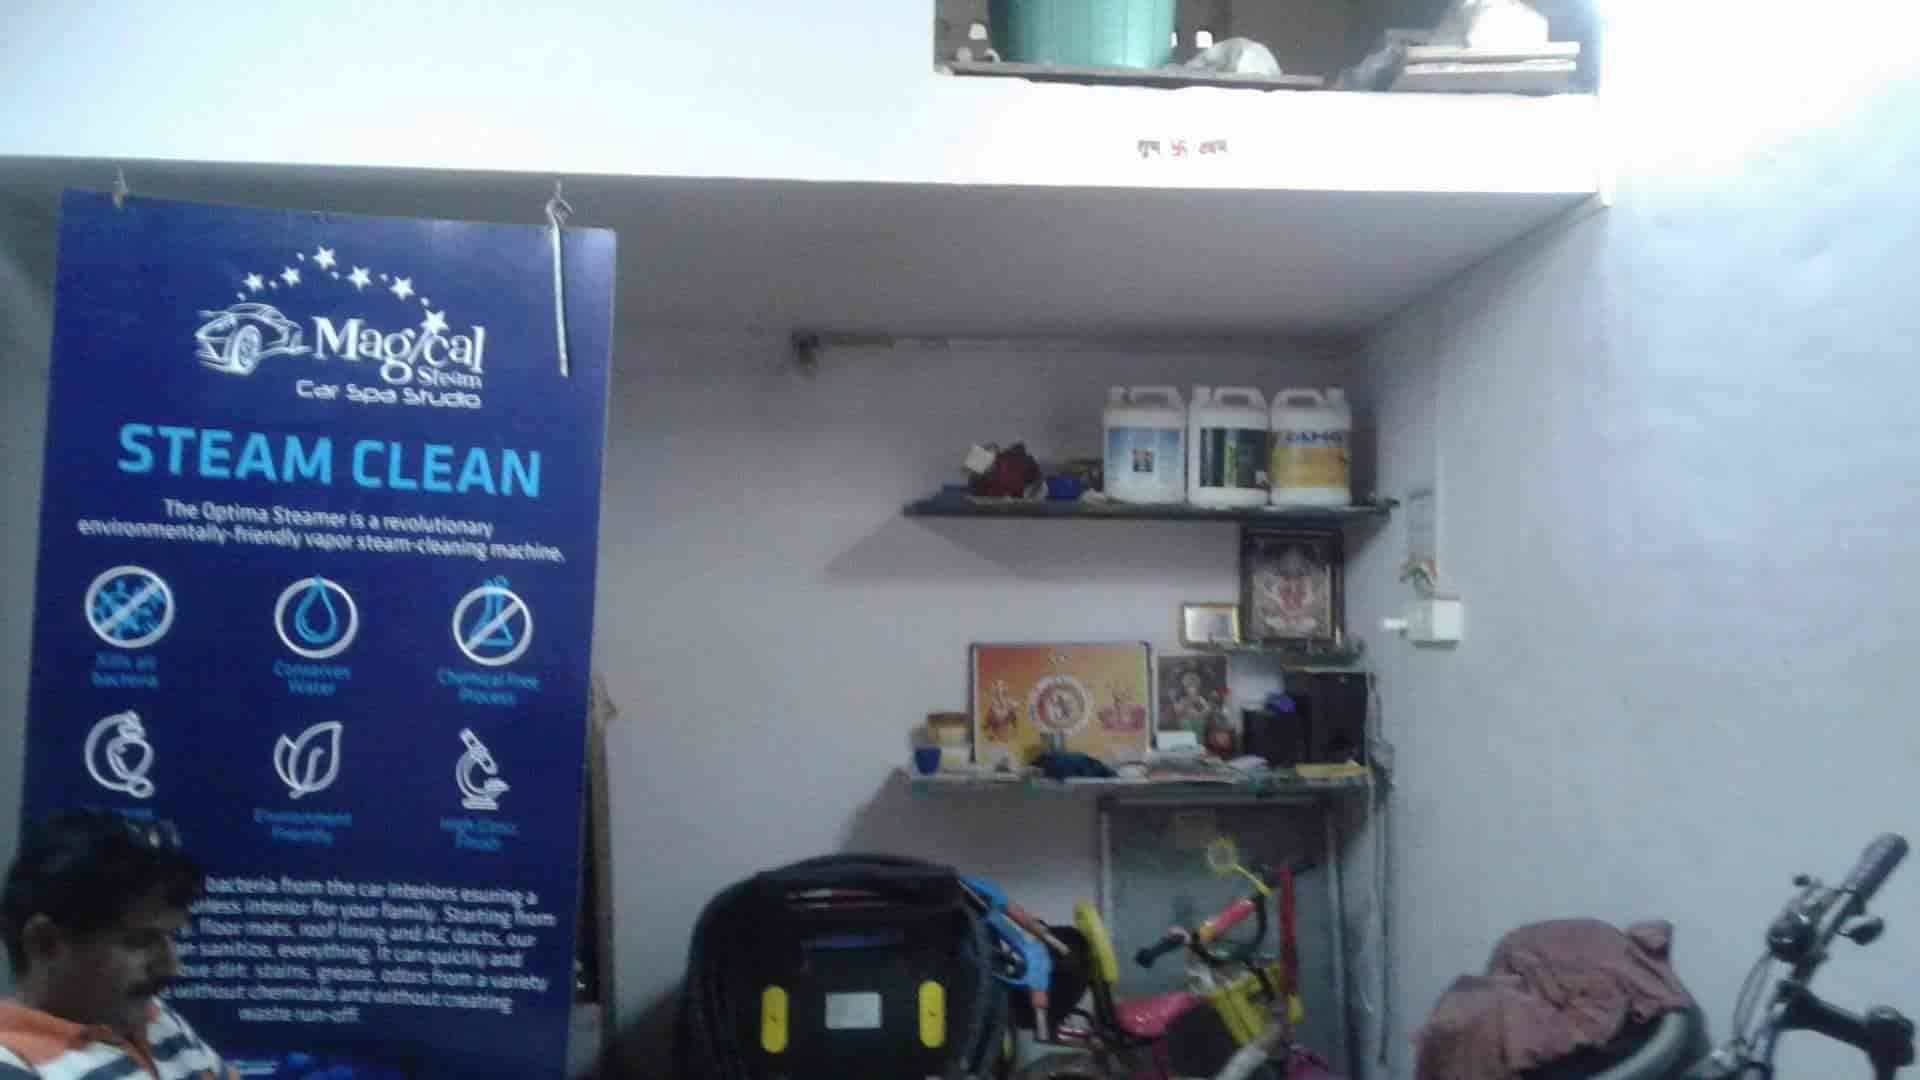 Magical Steam Car Spa Studio, Cbd Belapur - Car Polishing